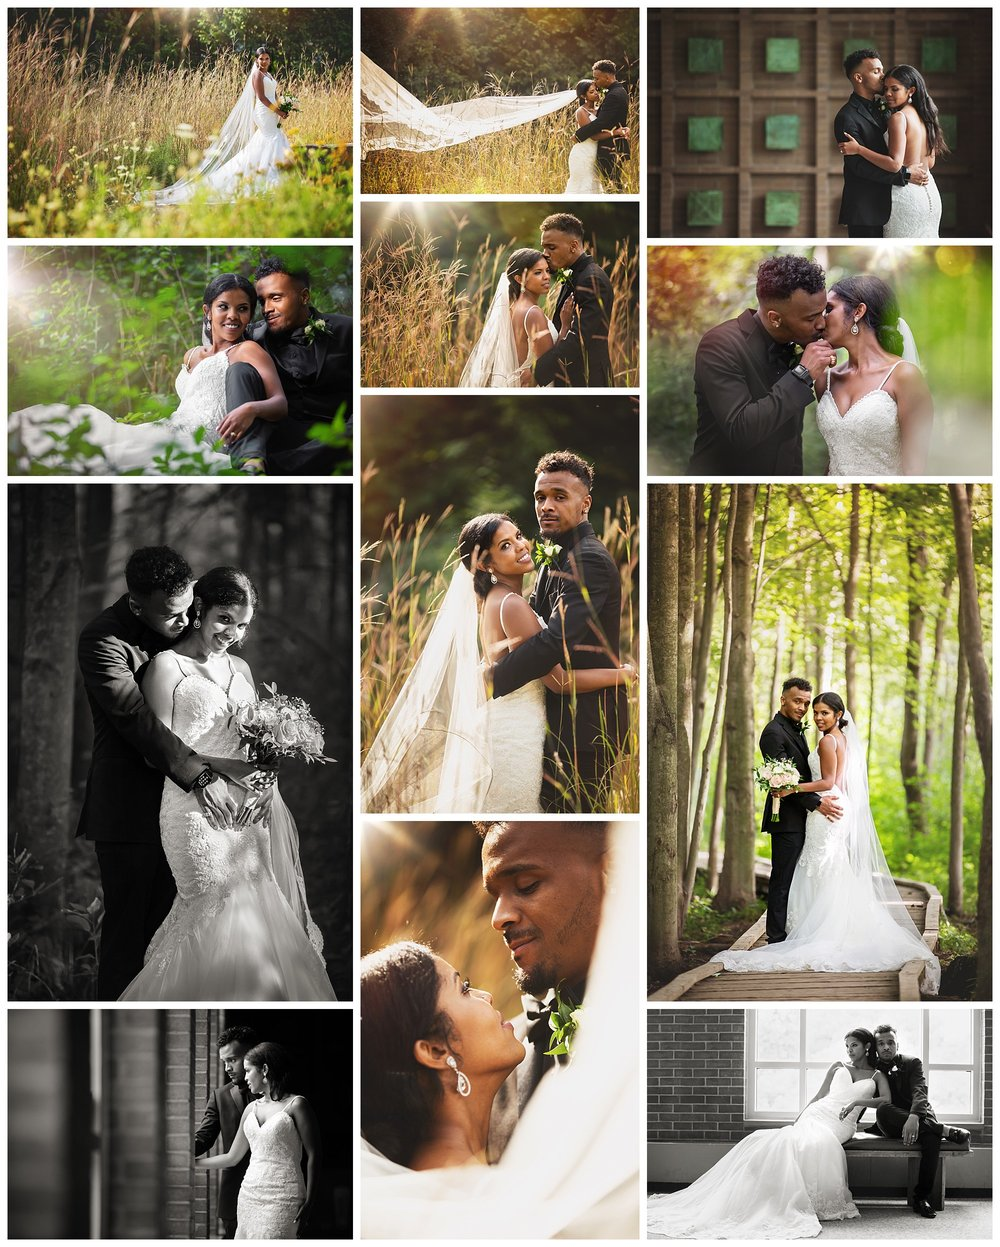 Centennial Hall & Sifton Bog, London, Ontario wedding photography by VanDaele & Russell